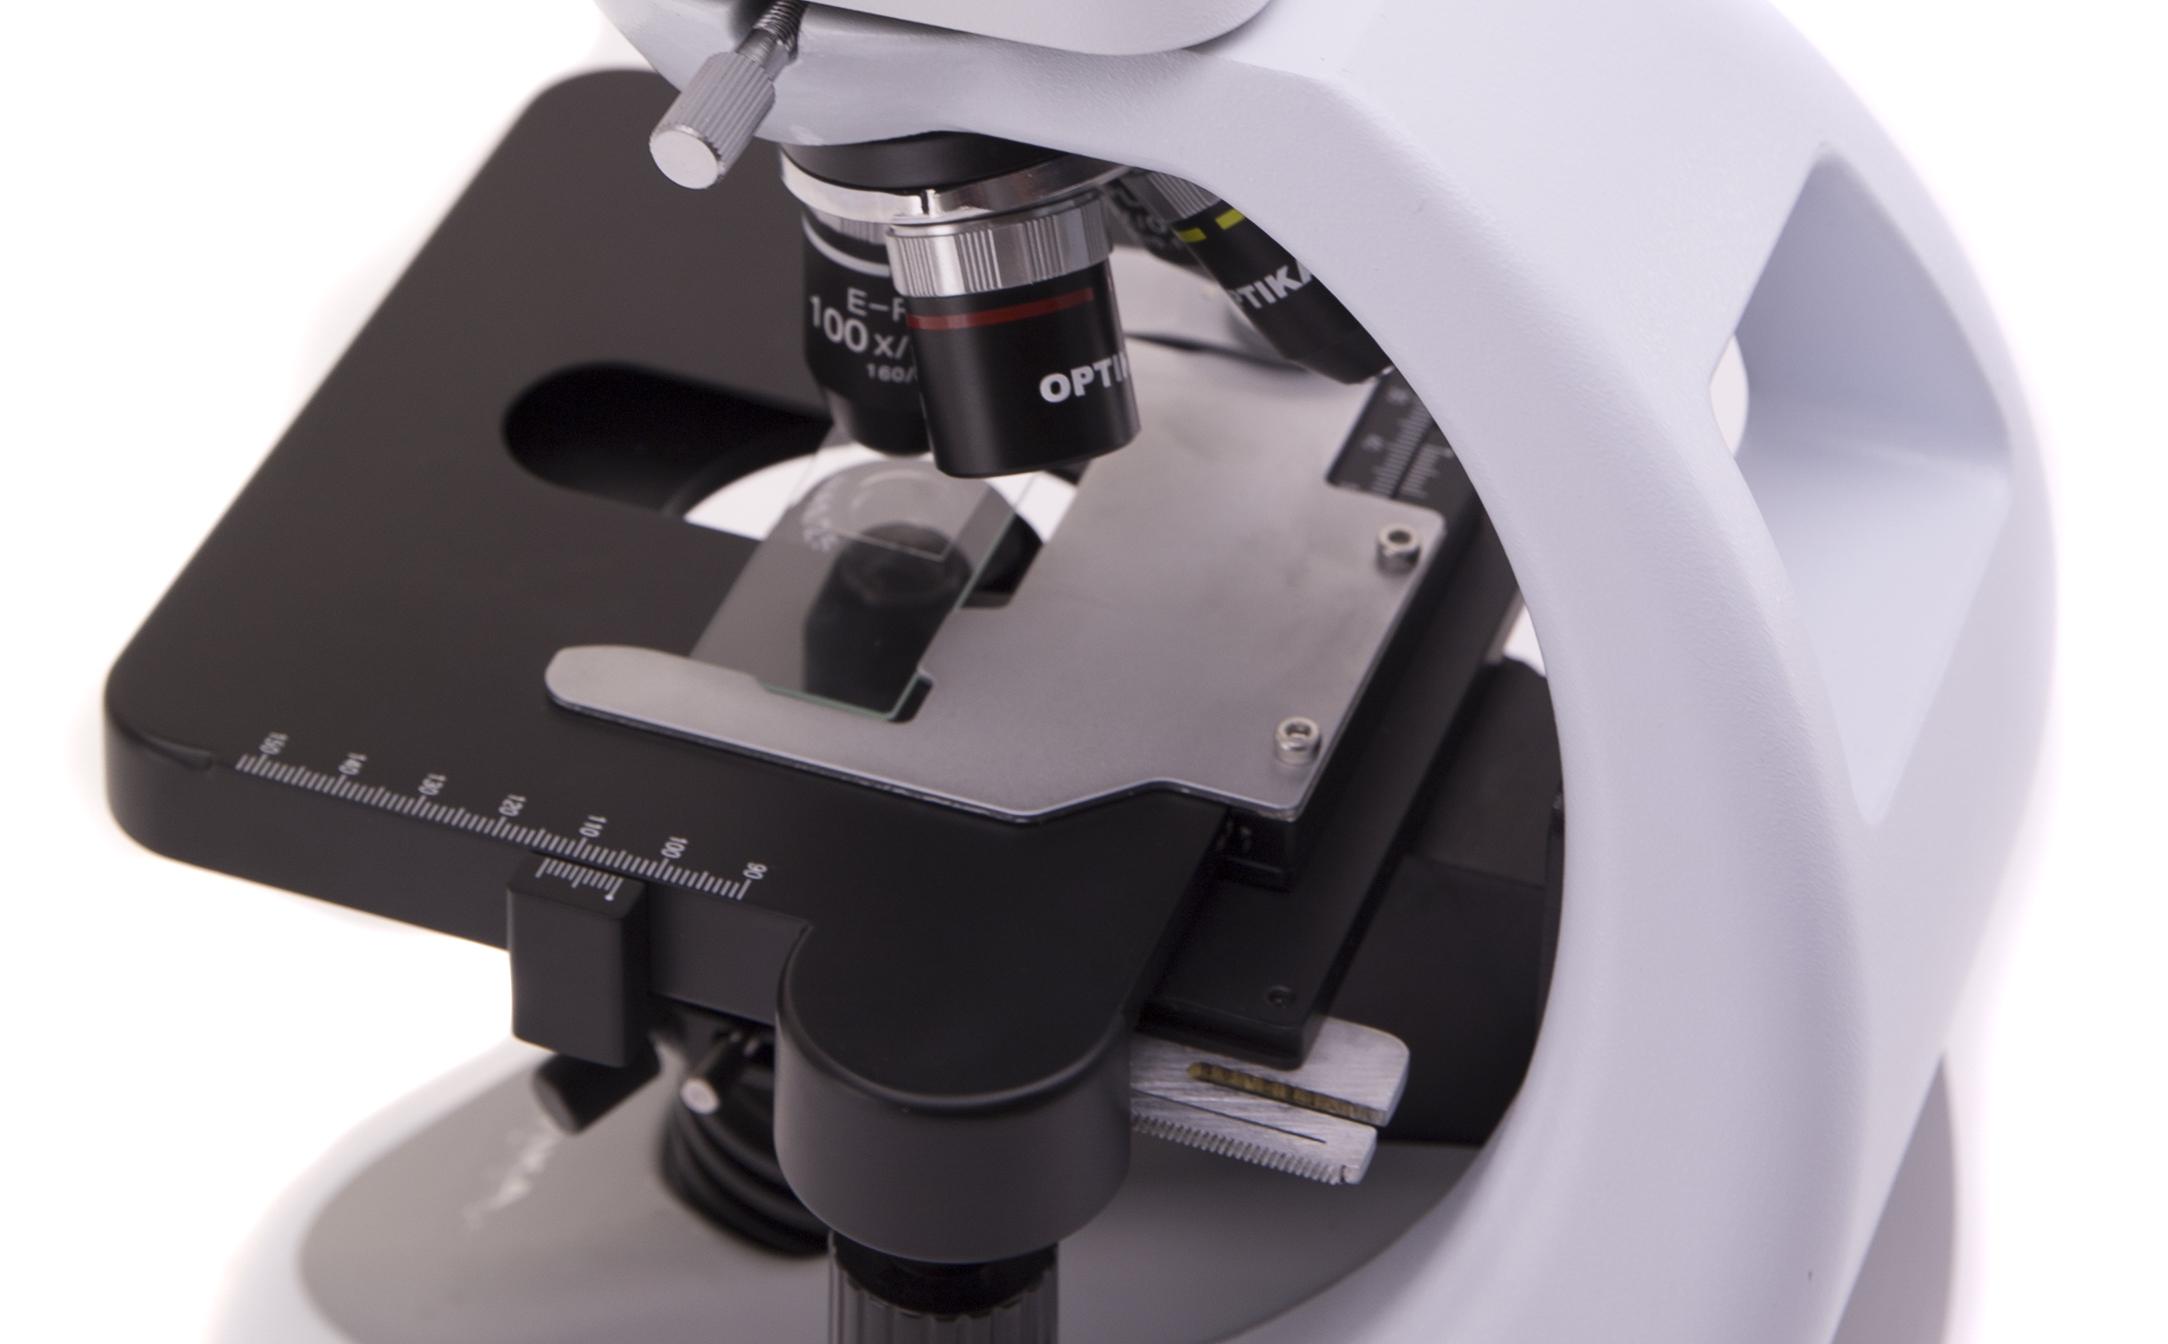 Mikroskop Optika B-290 konstrukcja